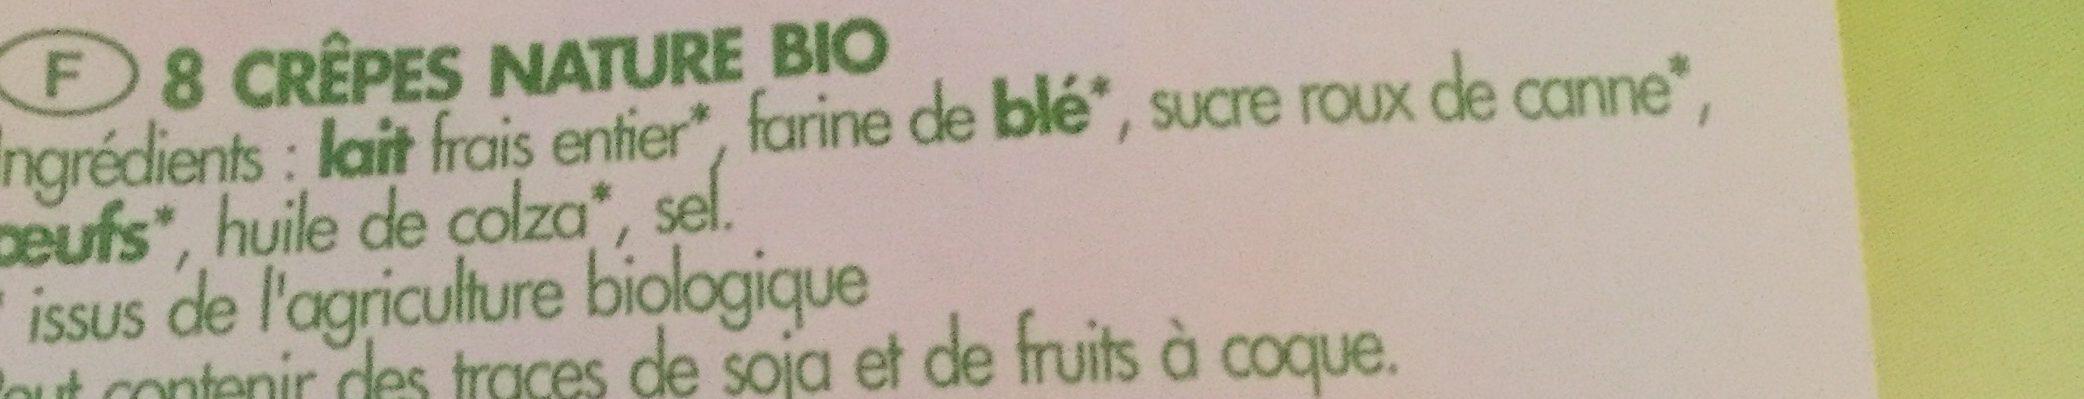 Crêpes nature bio - Ingredients